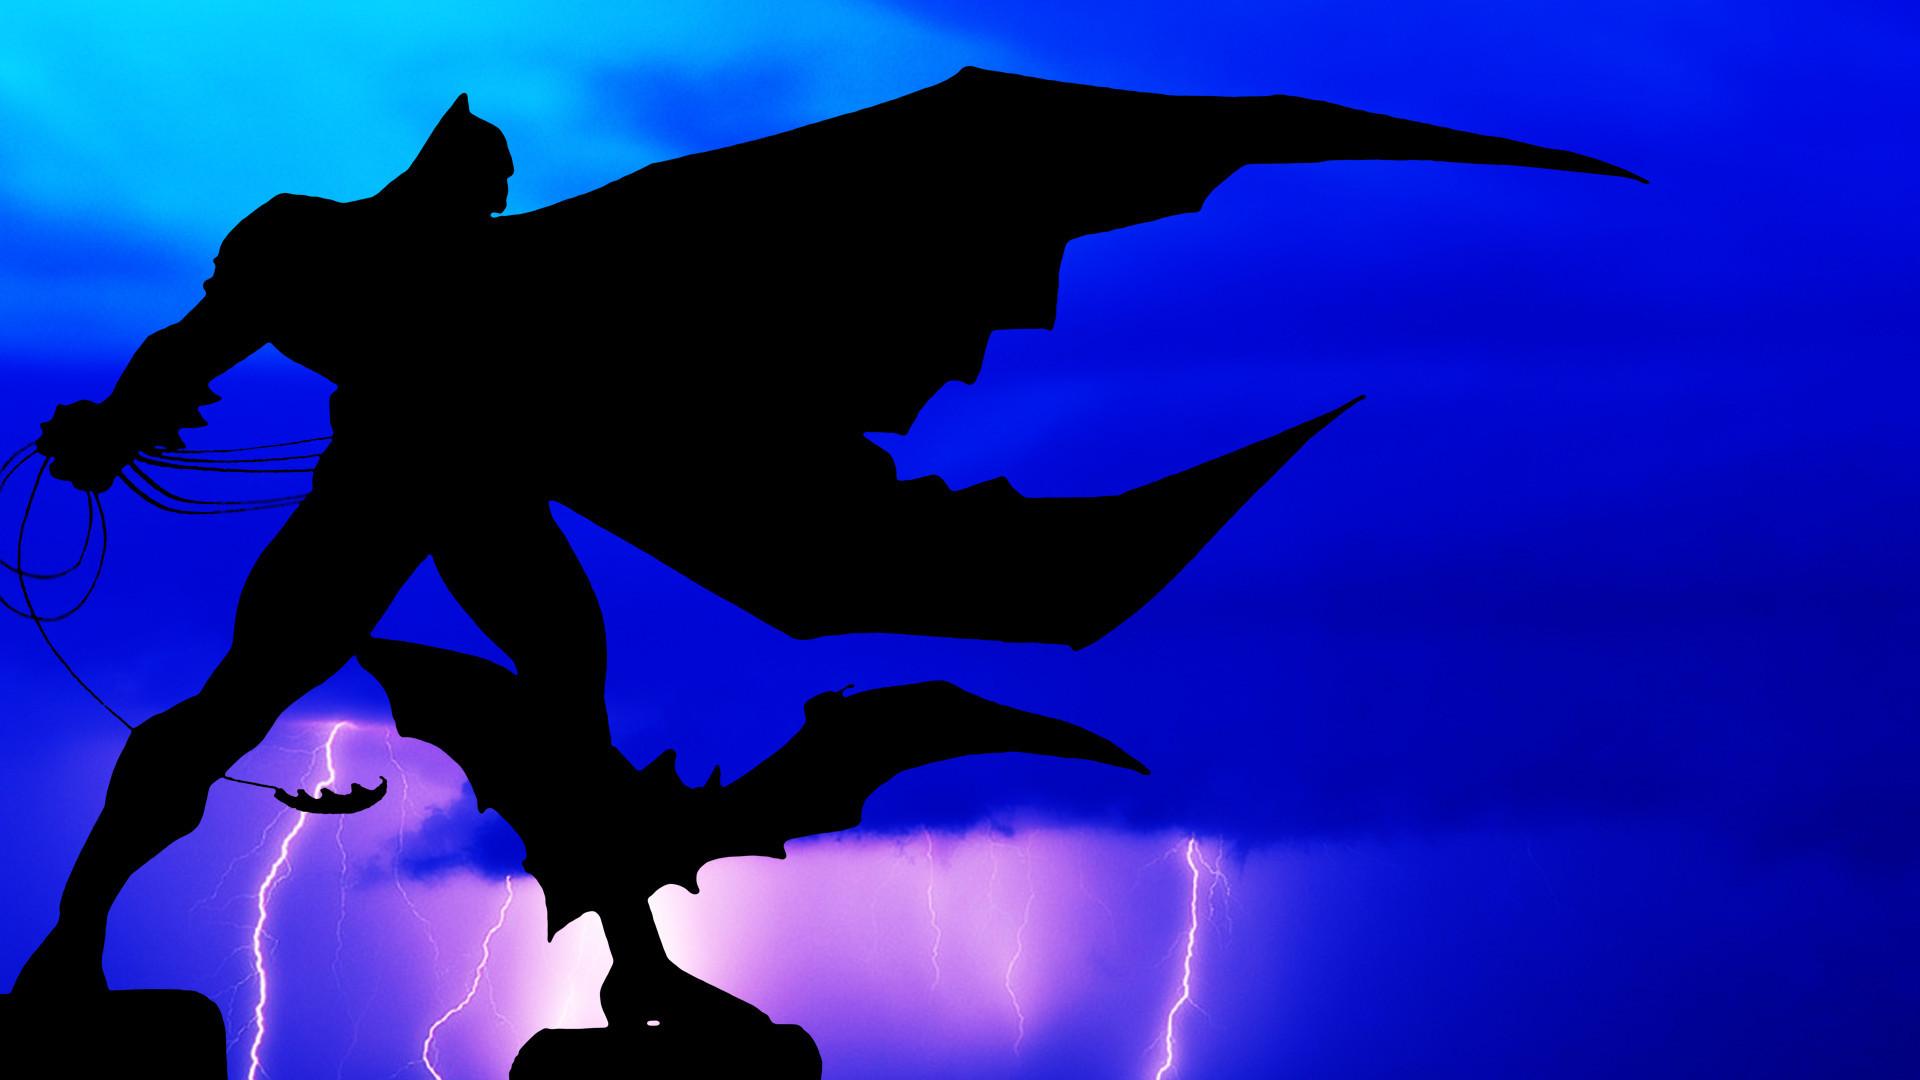 The Dark Knight Returns Wallpaper by RollingTombstone The Dark Knight  Returns Wallpaper by RollingTombstone